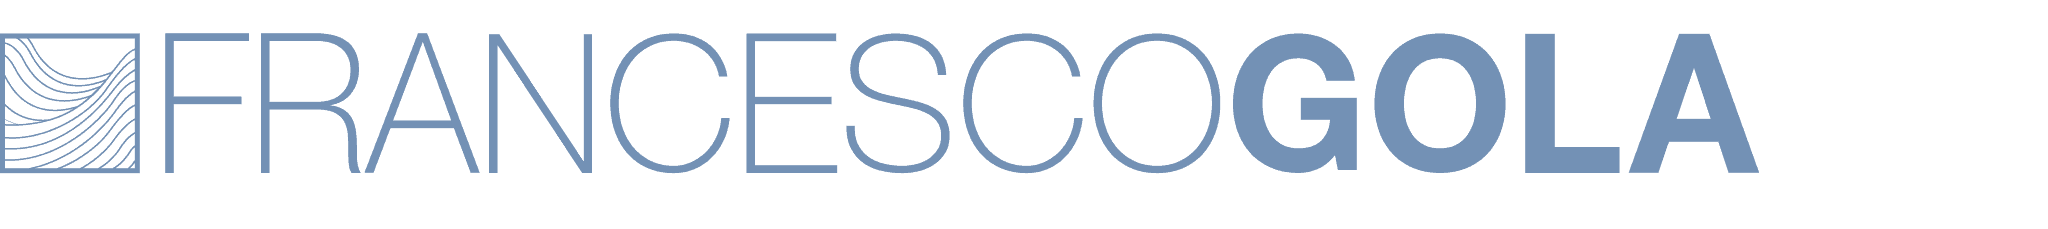 Francesco Gola Logo